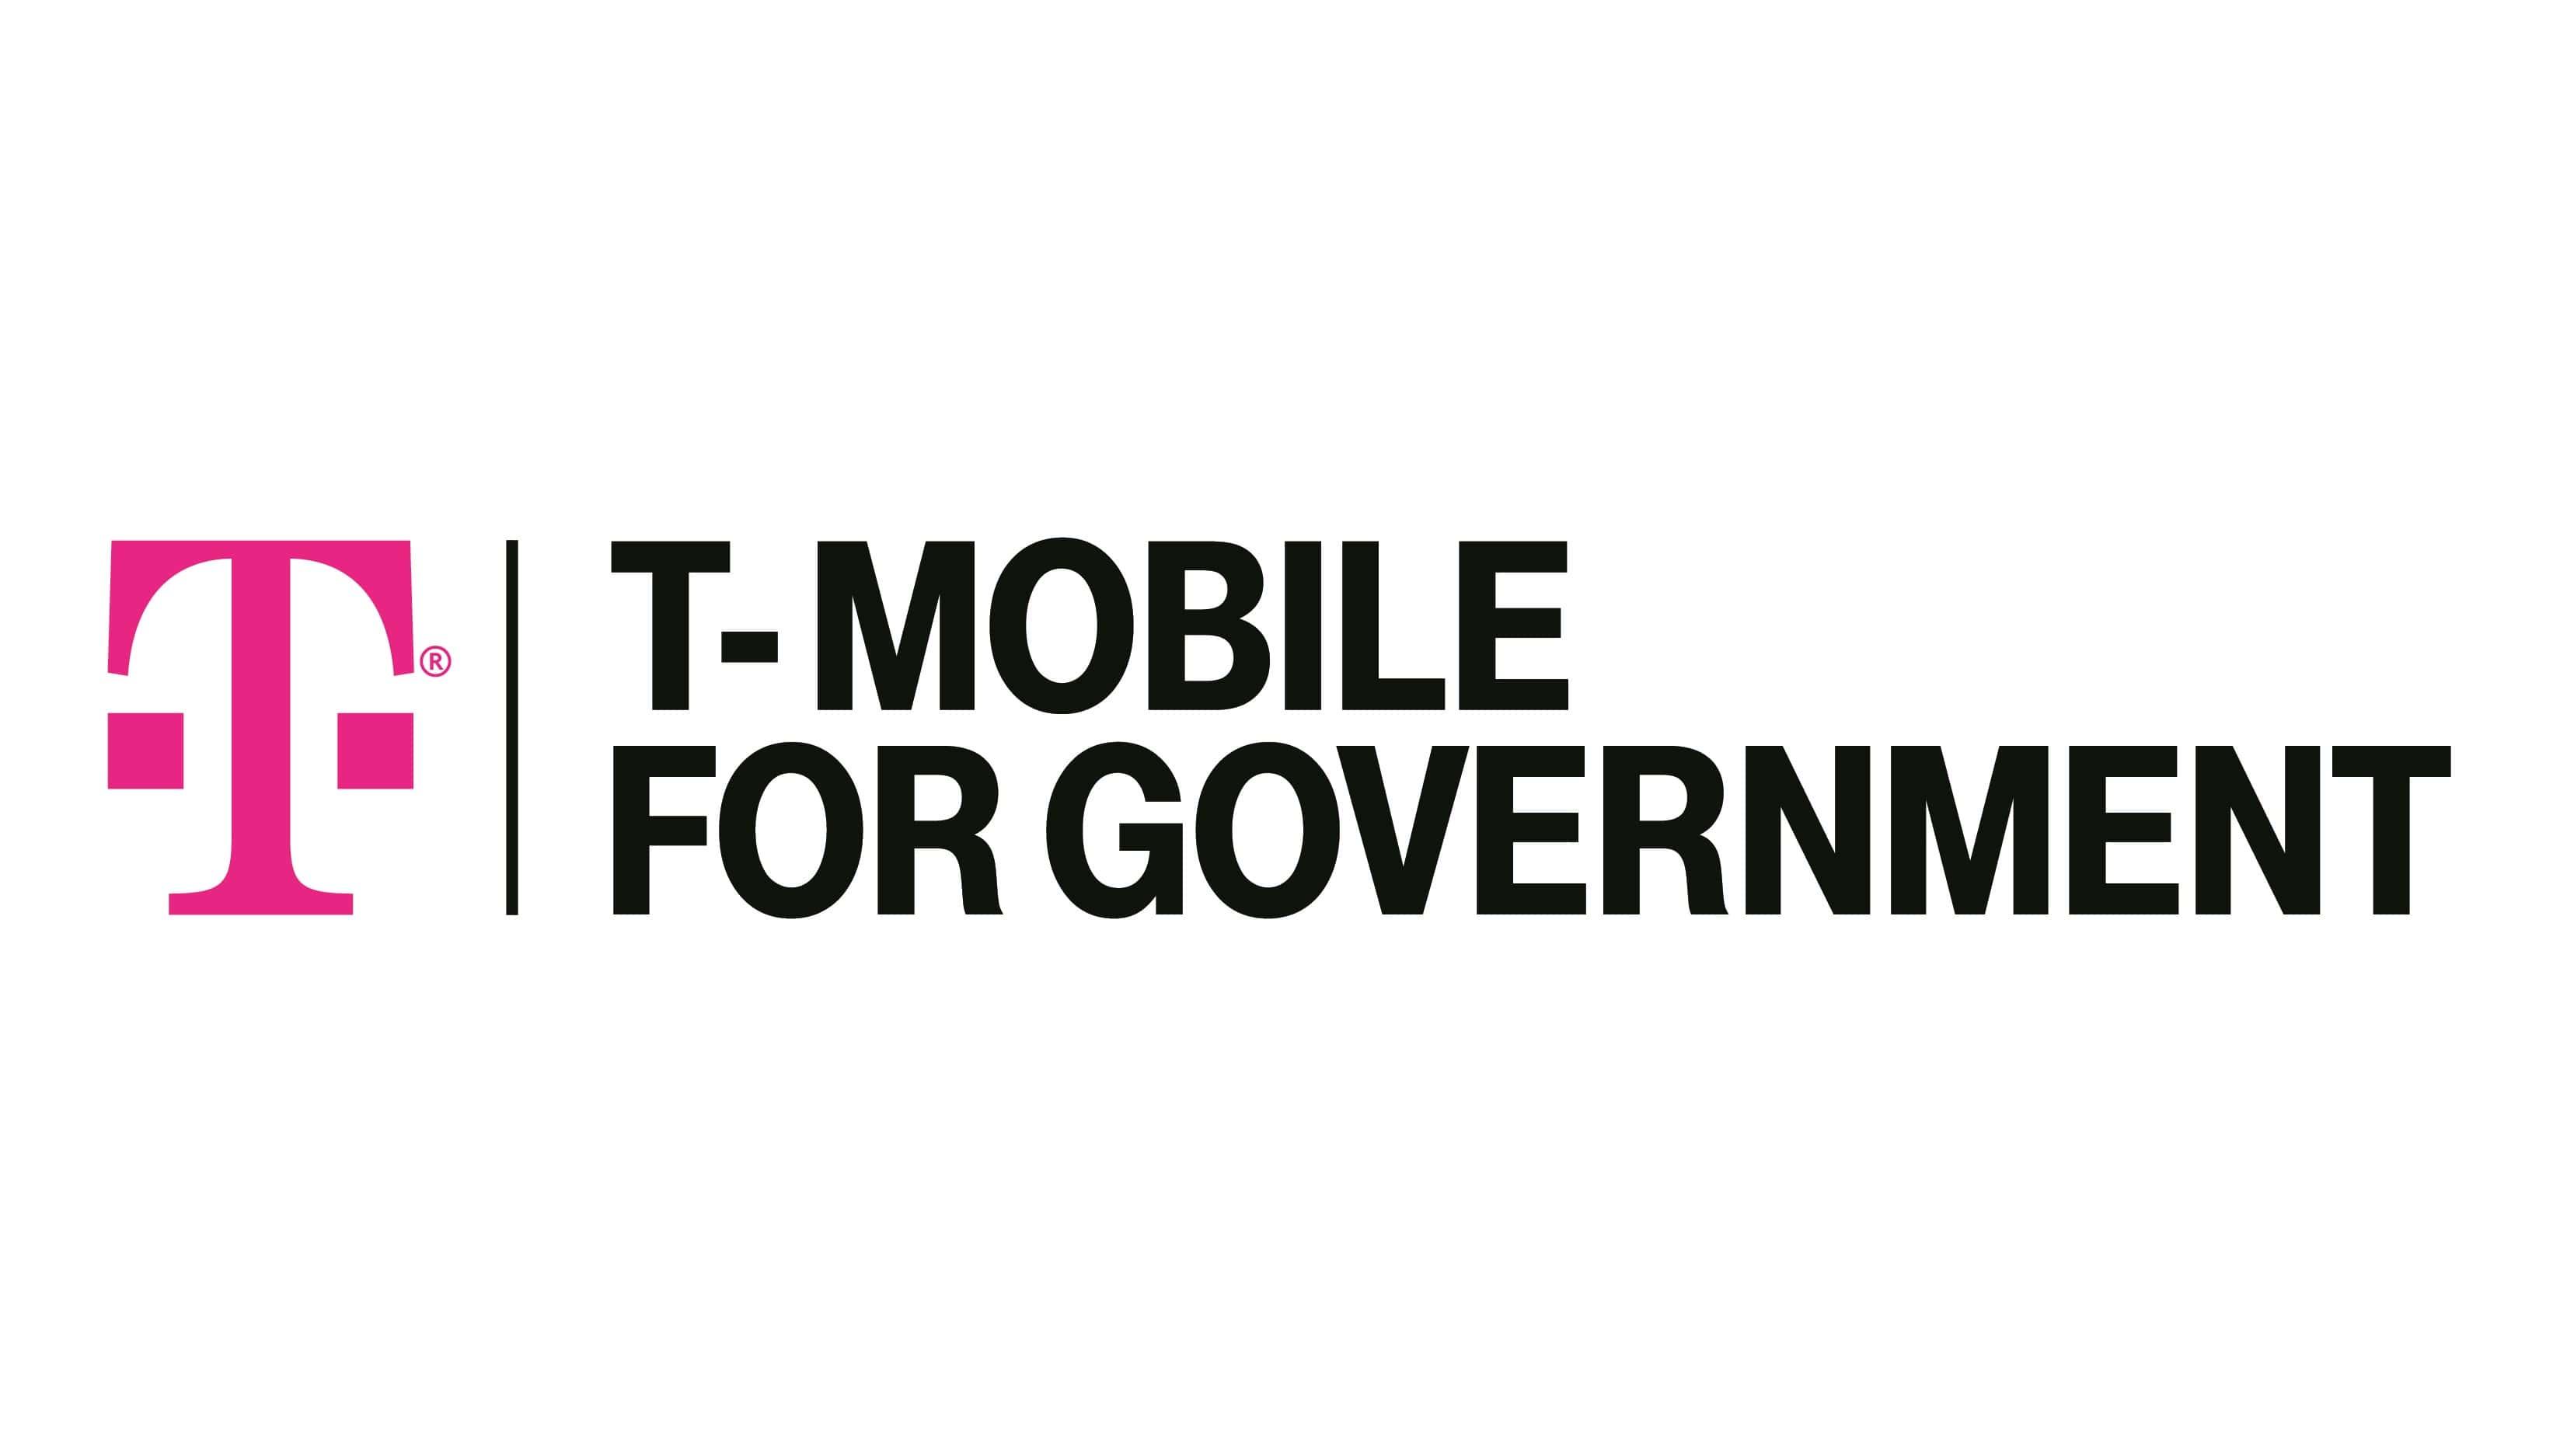 TMO_Government_LOCKUP_CMYK_OnW-min